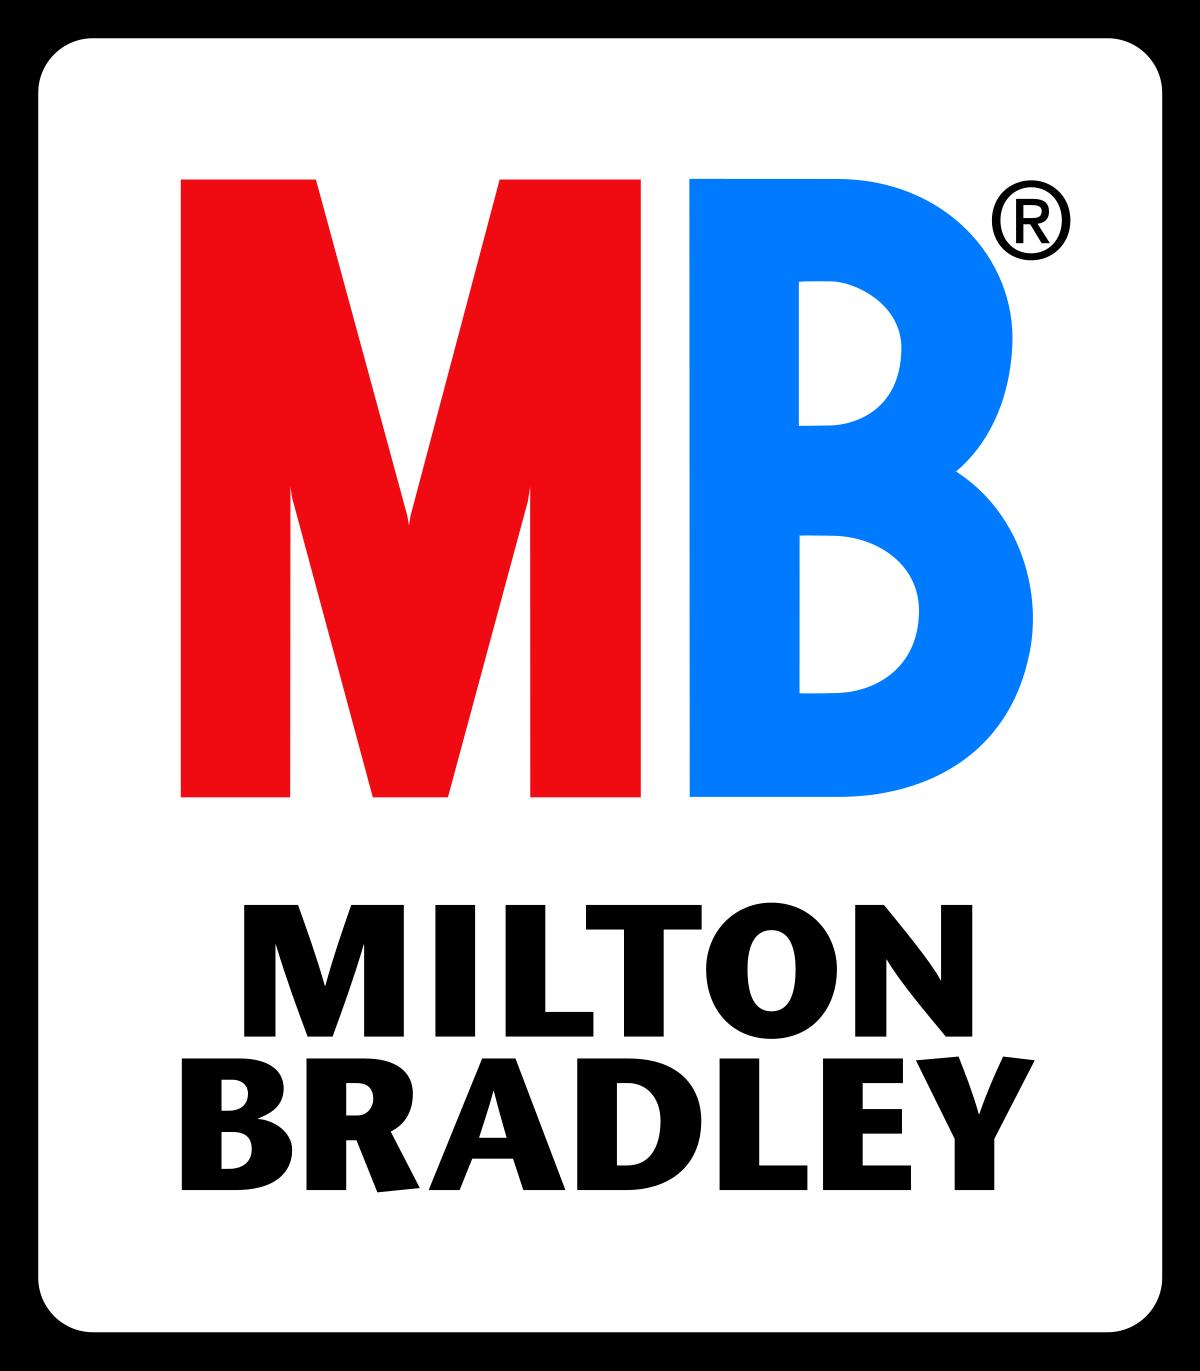 MILTON BRADLEY